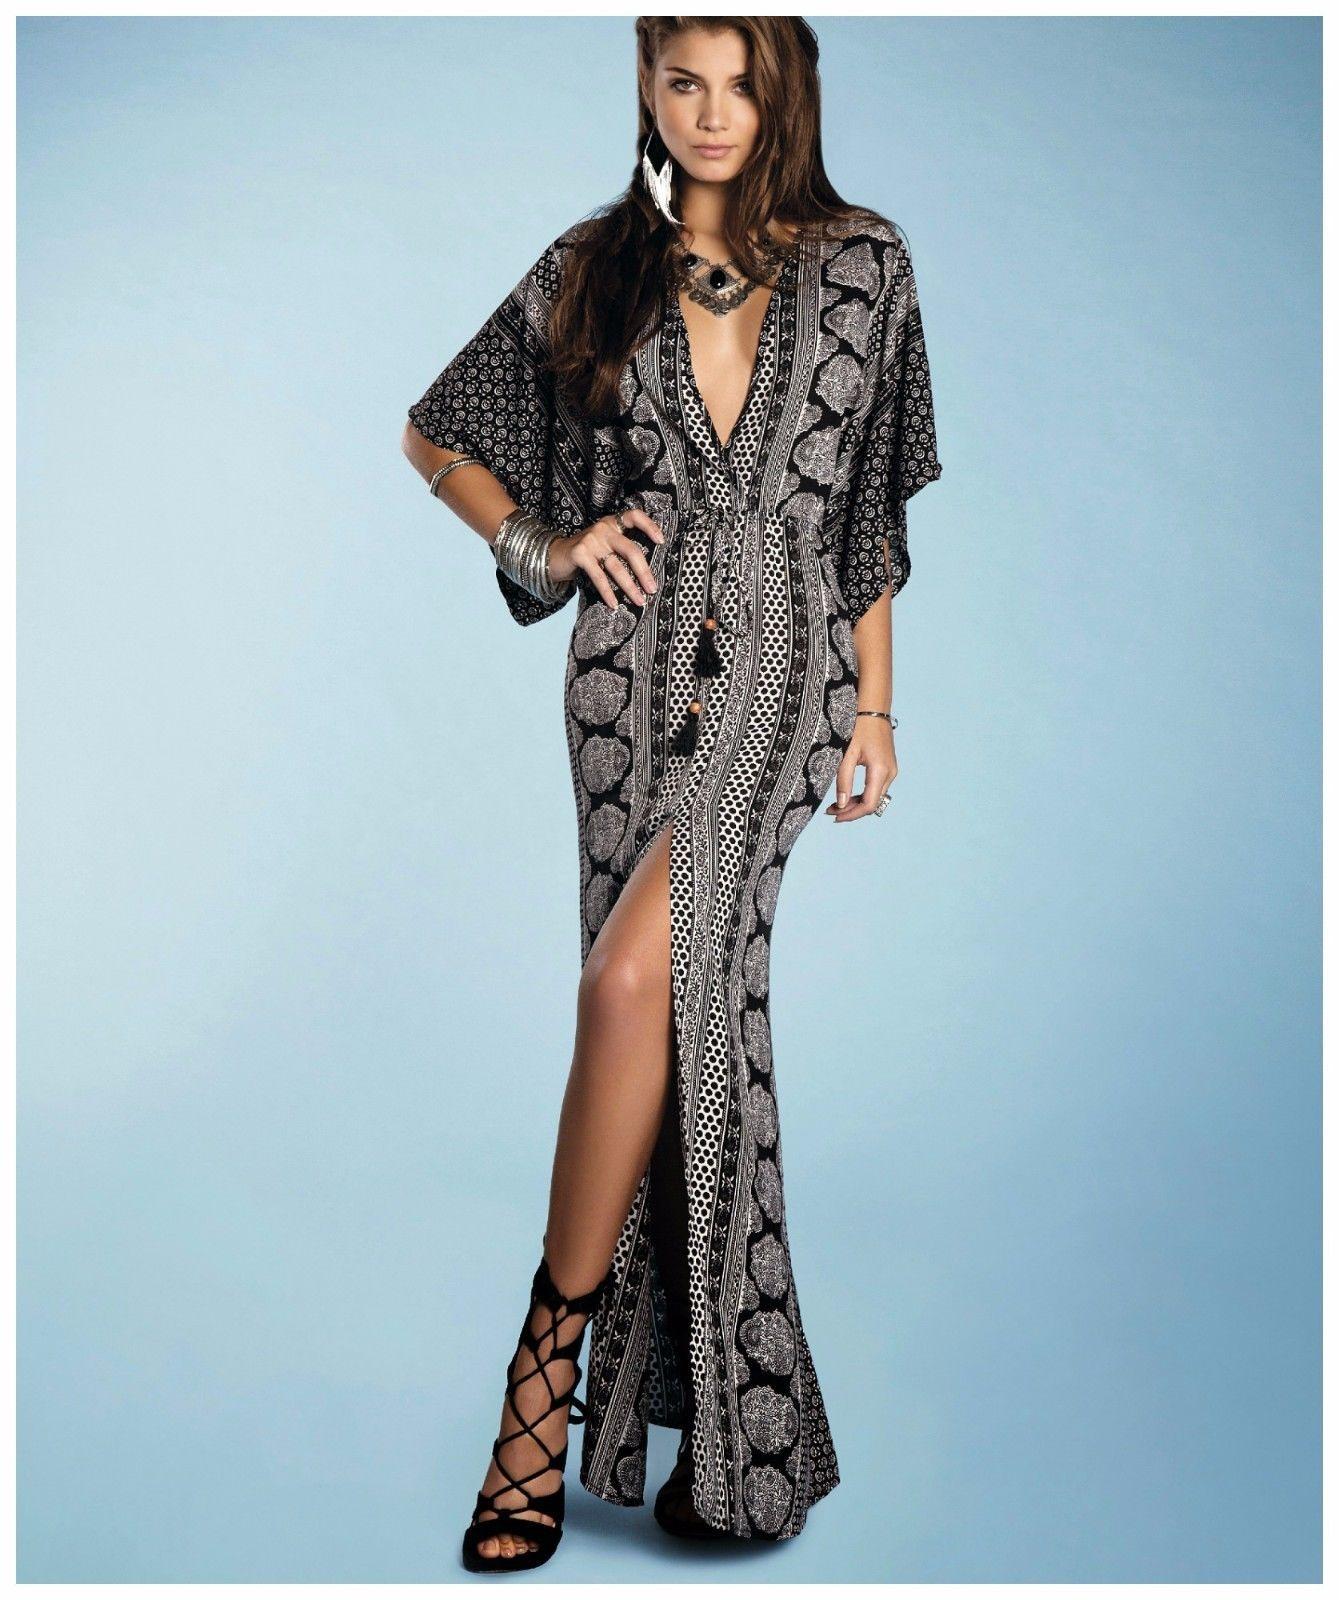 Elan Boho Paisley Sexy Black White Gypsy Kaftan Maxi Dress Deep V Front  Slit  576271ead